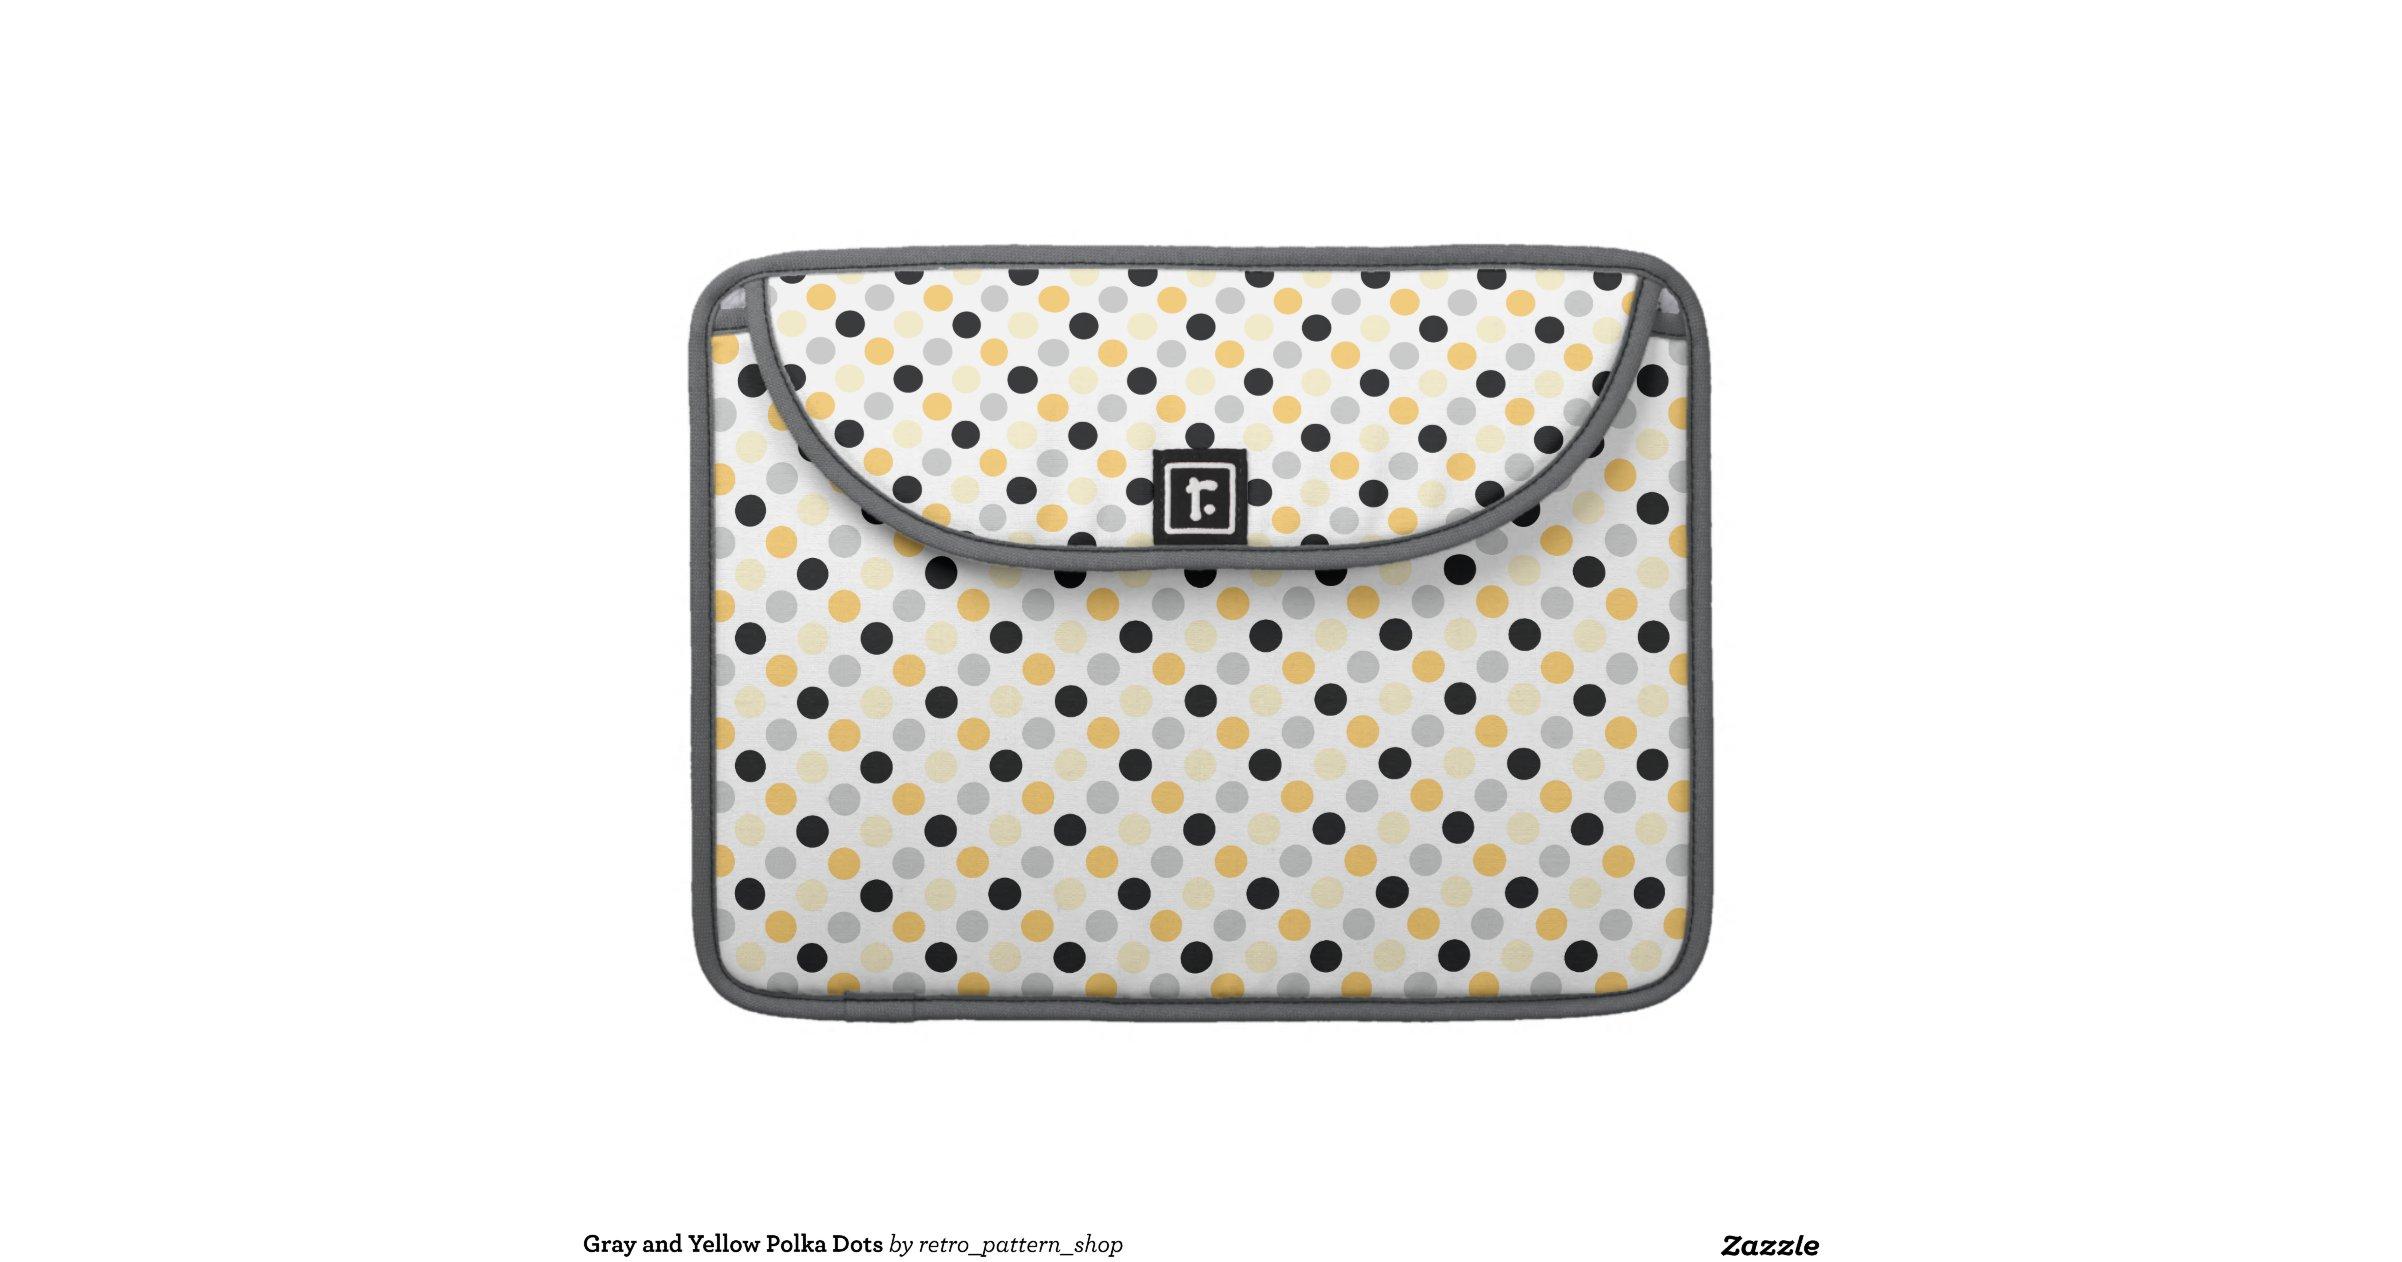 gray and yellow polka dots macbook pro sleeve    Yellow And Gray Polka Dots